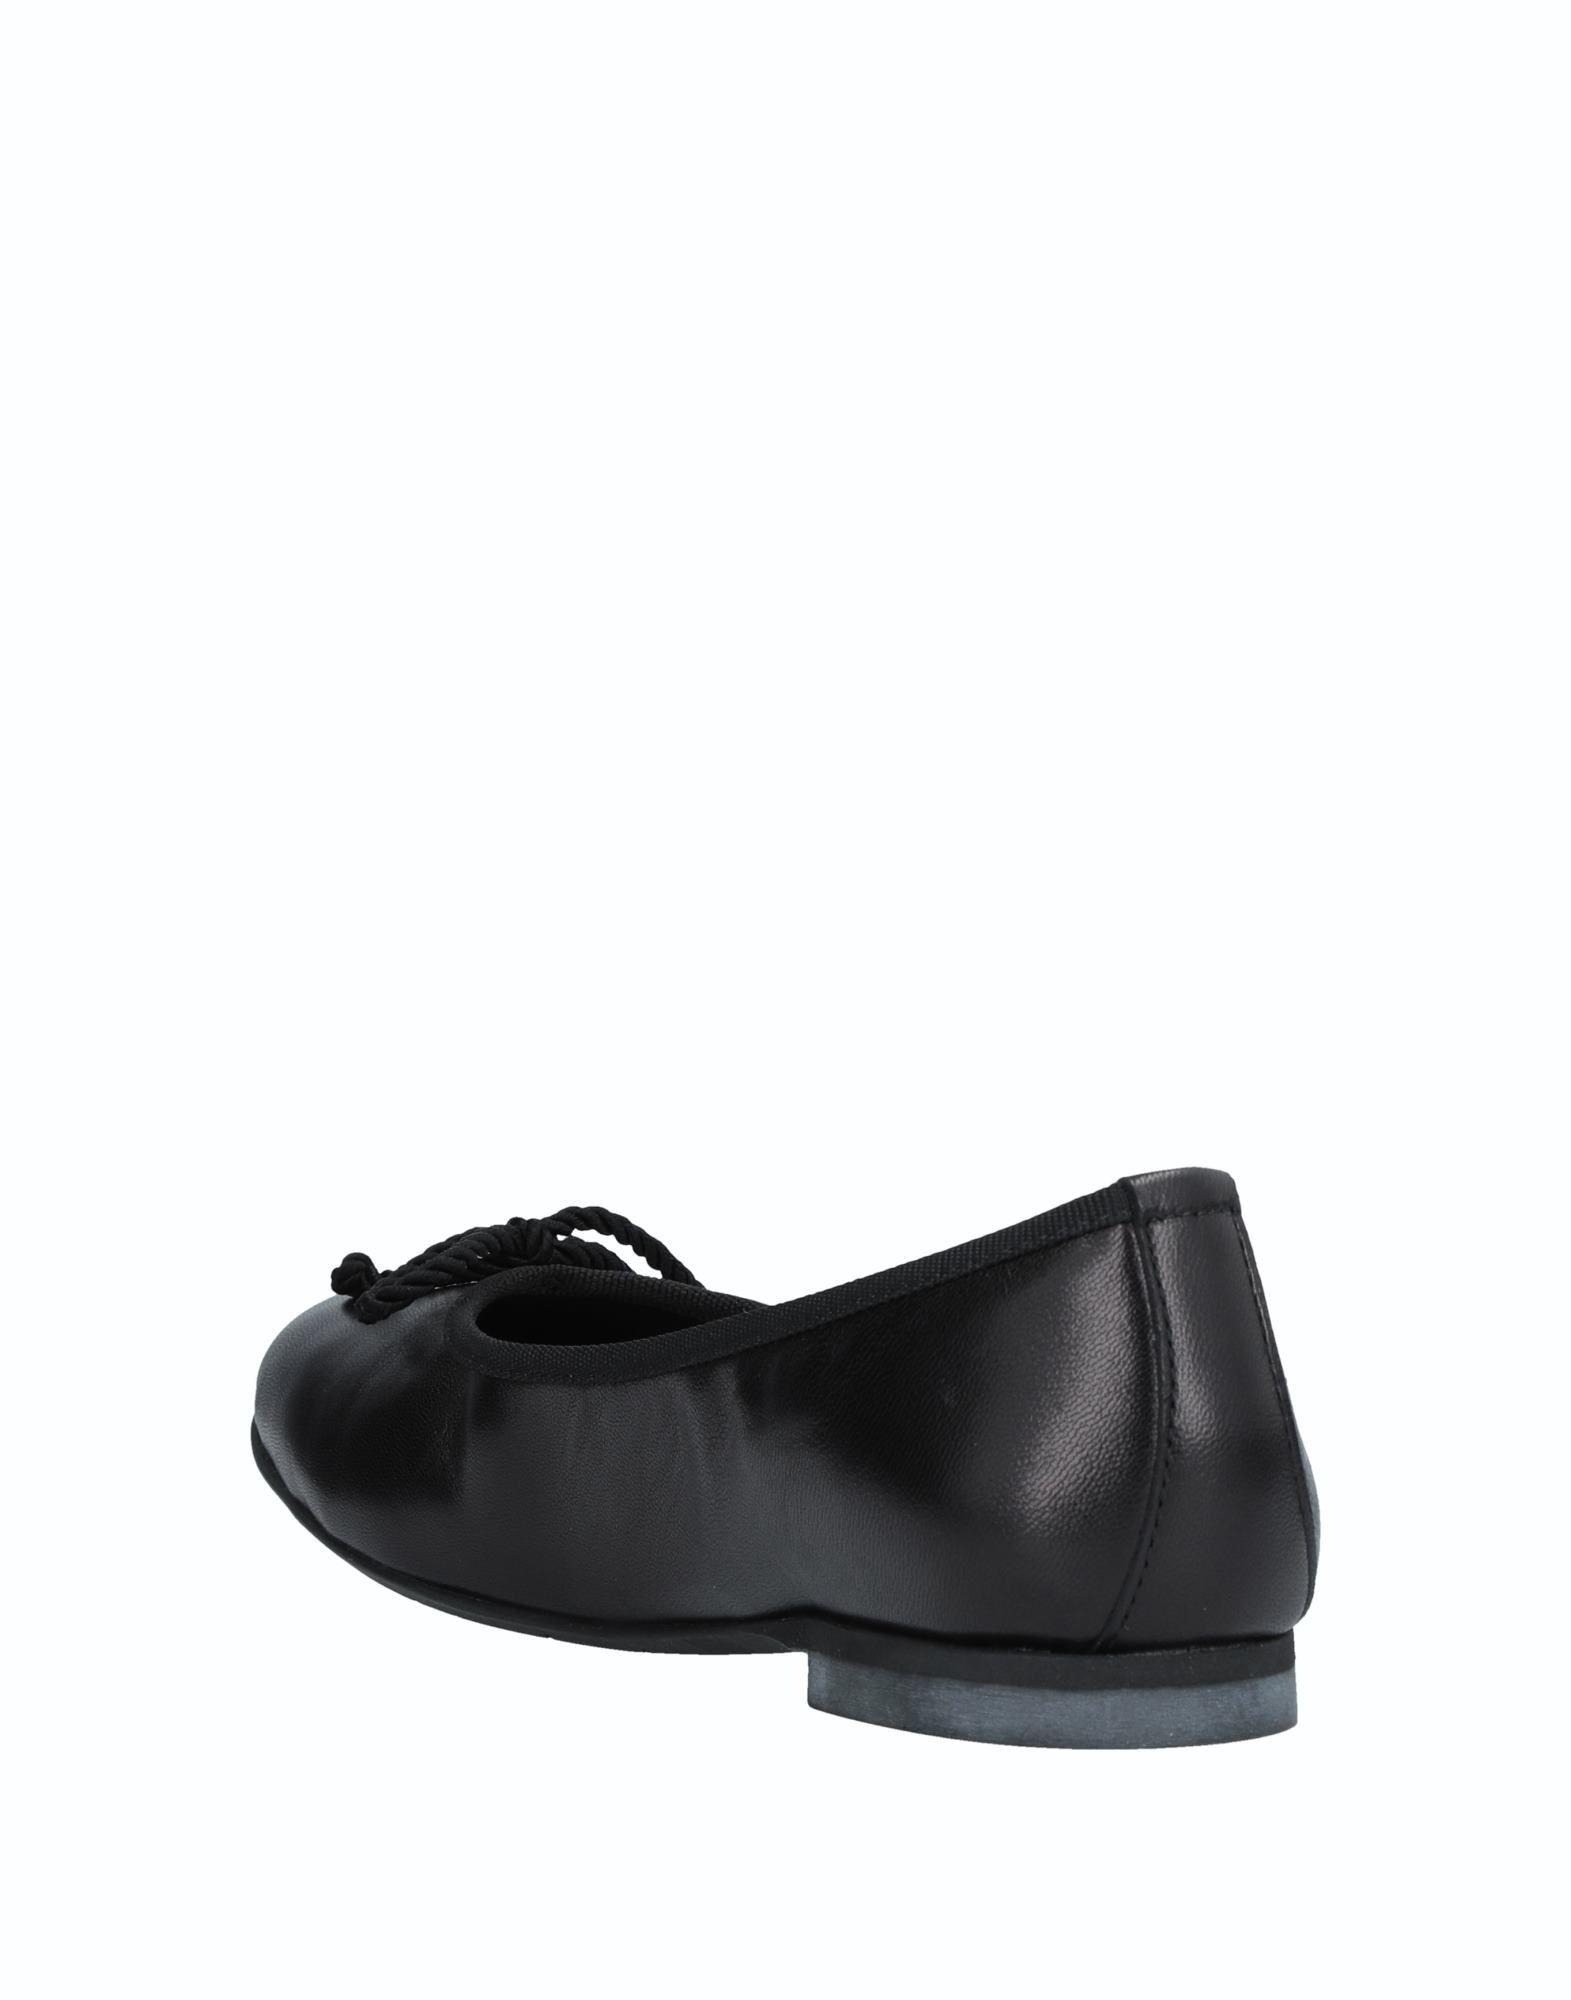 Woolline Ballerinas Qualität Damen  11537195FR Gute Qualität Ballerinas beliebte Schuhe fa4a9a